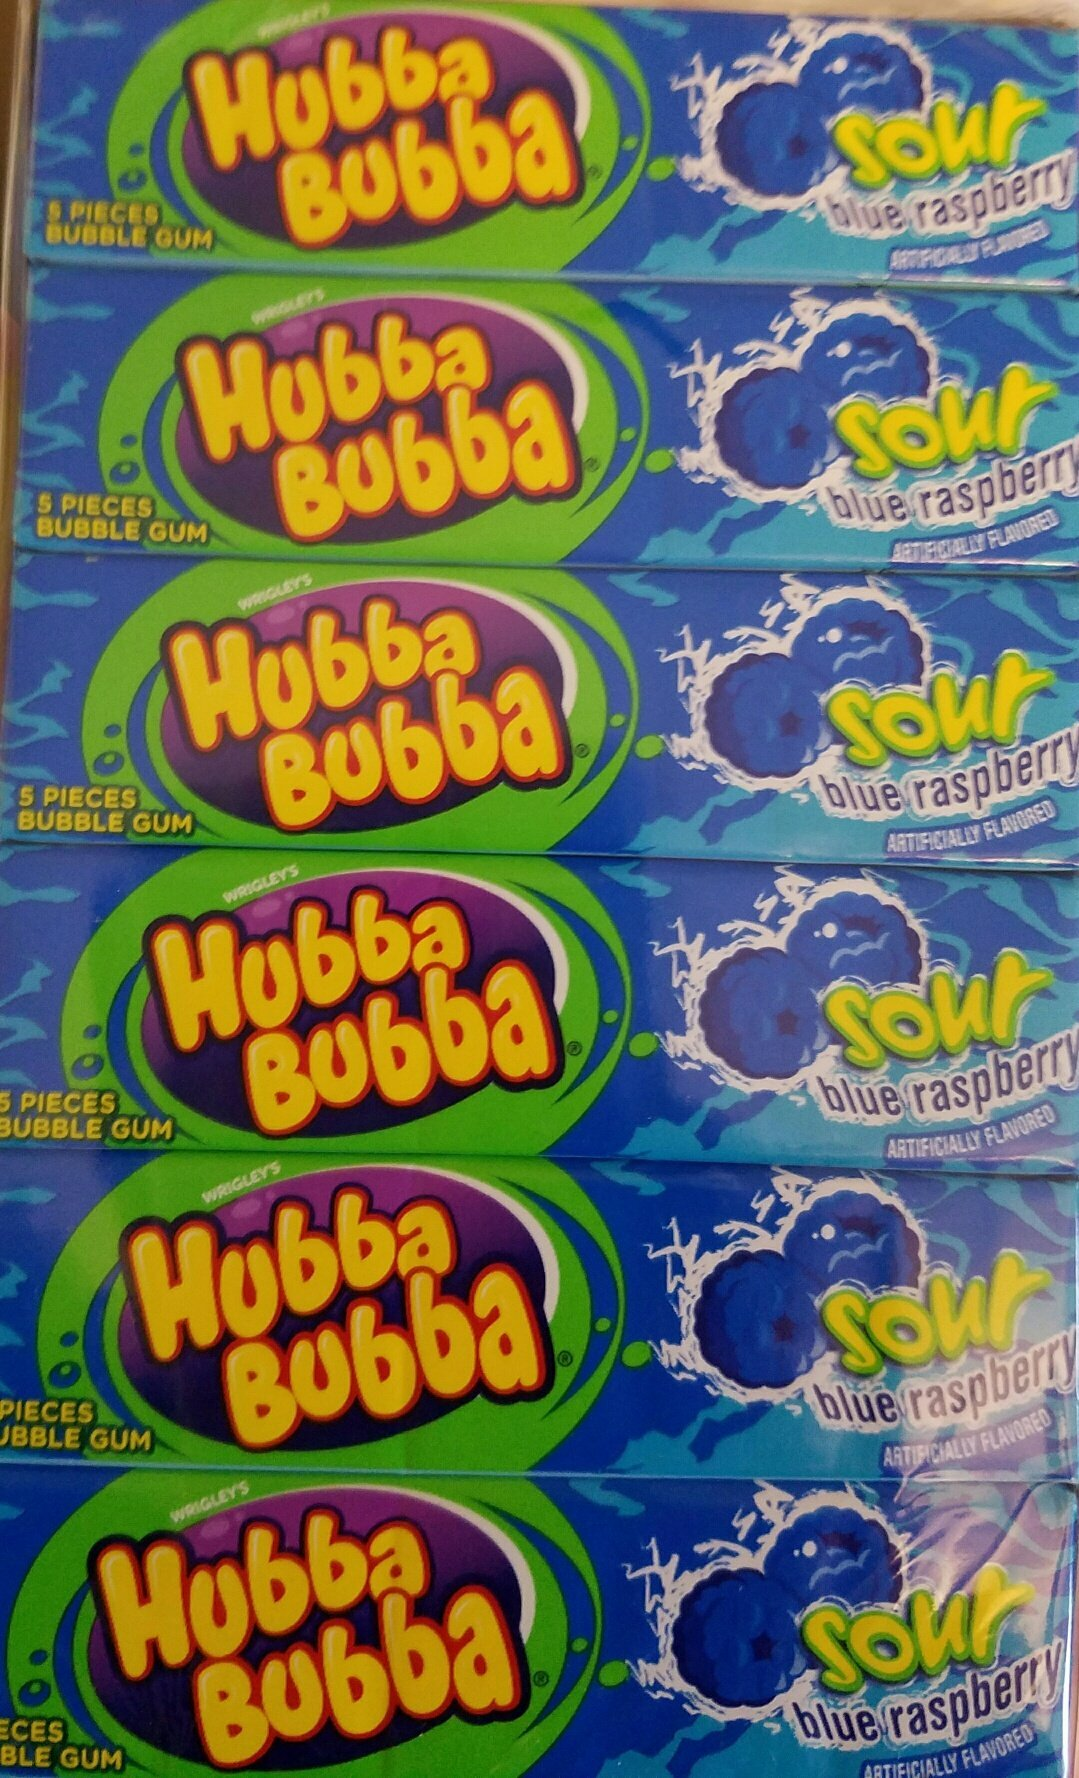 Hubba Bubba Sour Blue Raspberry 18 Count